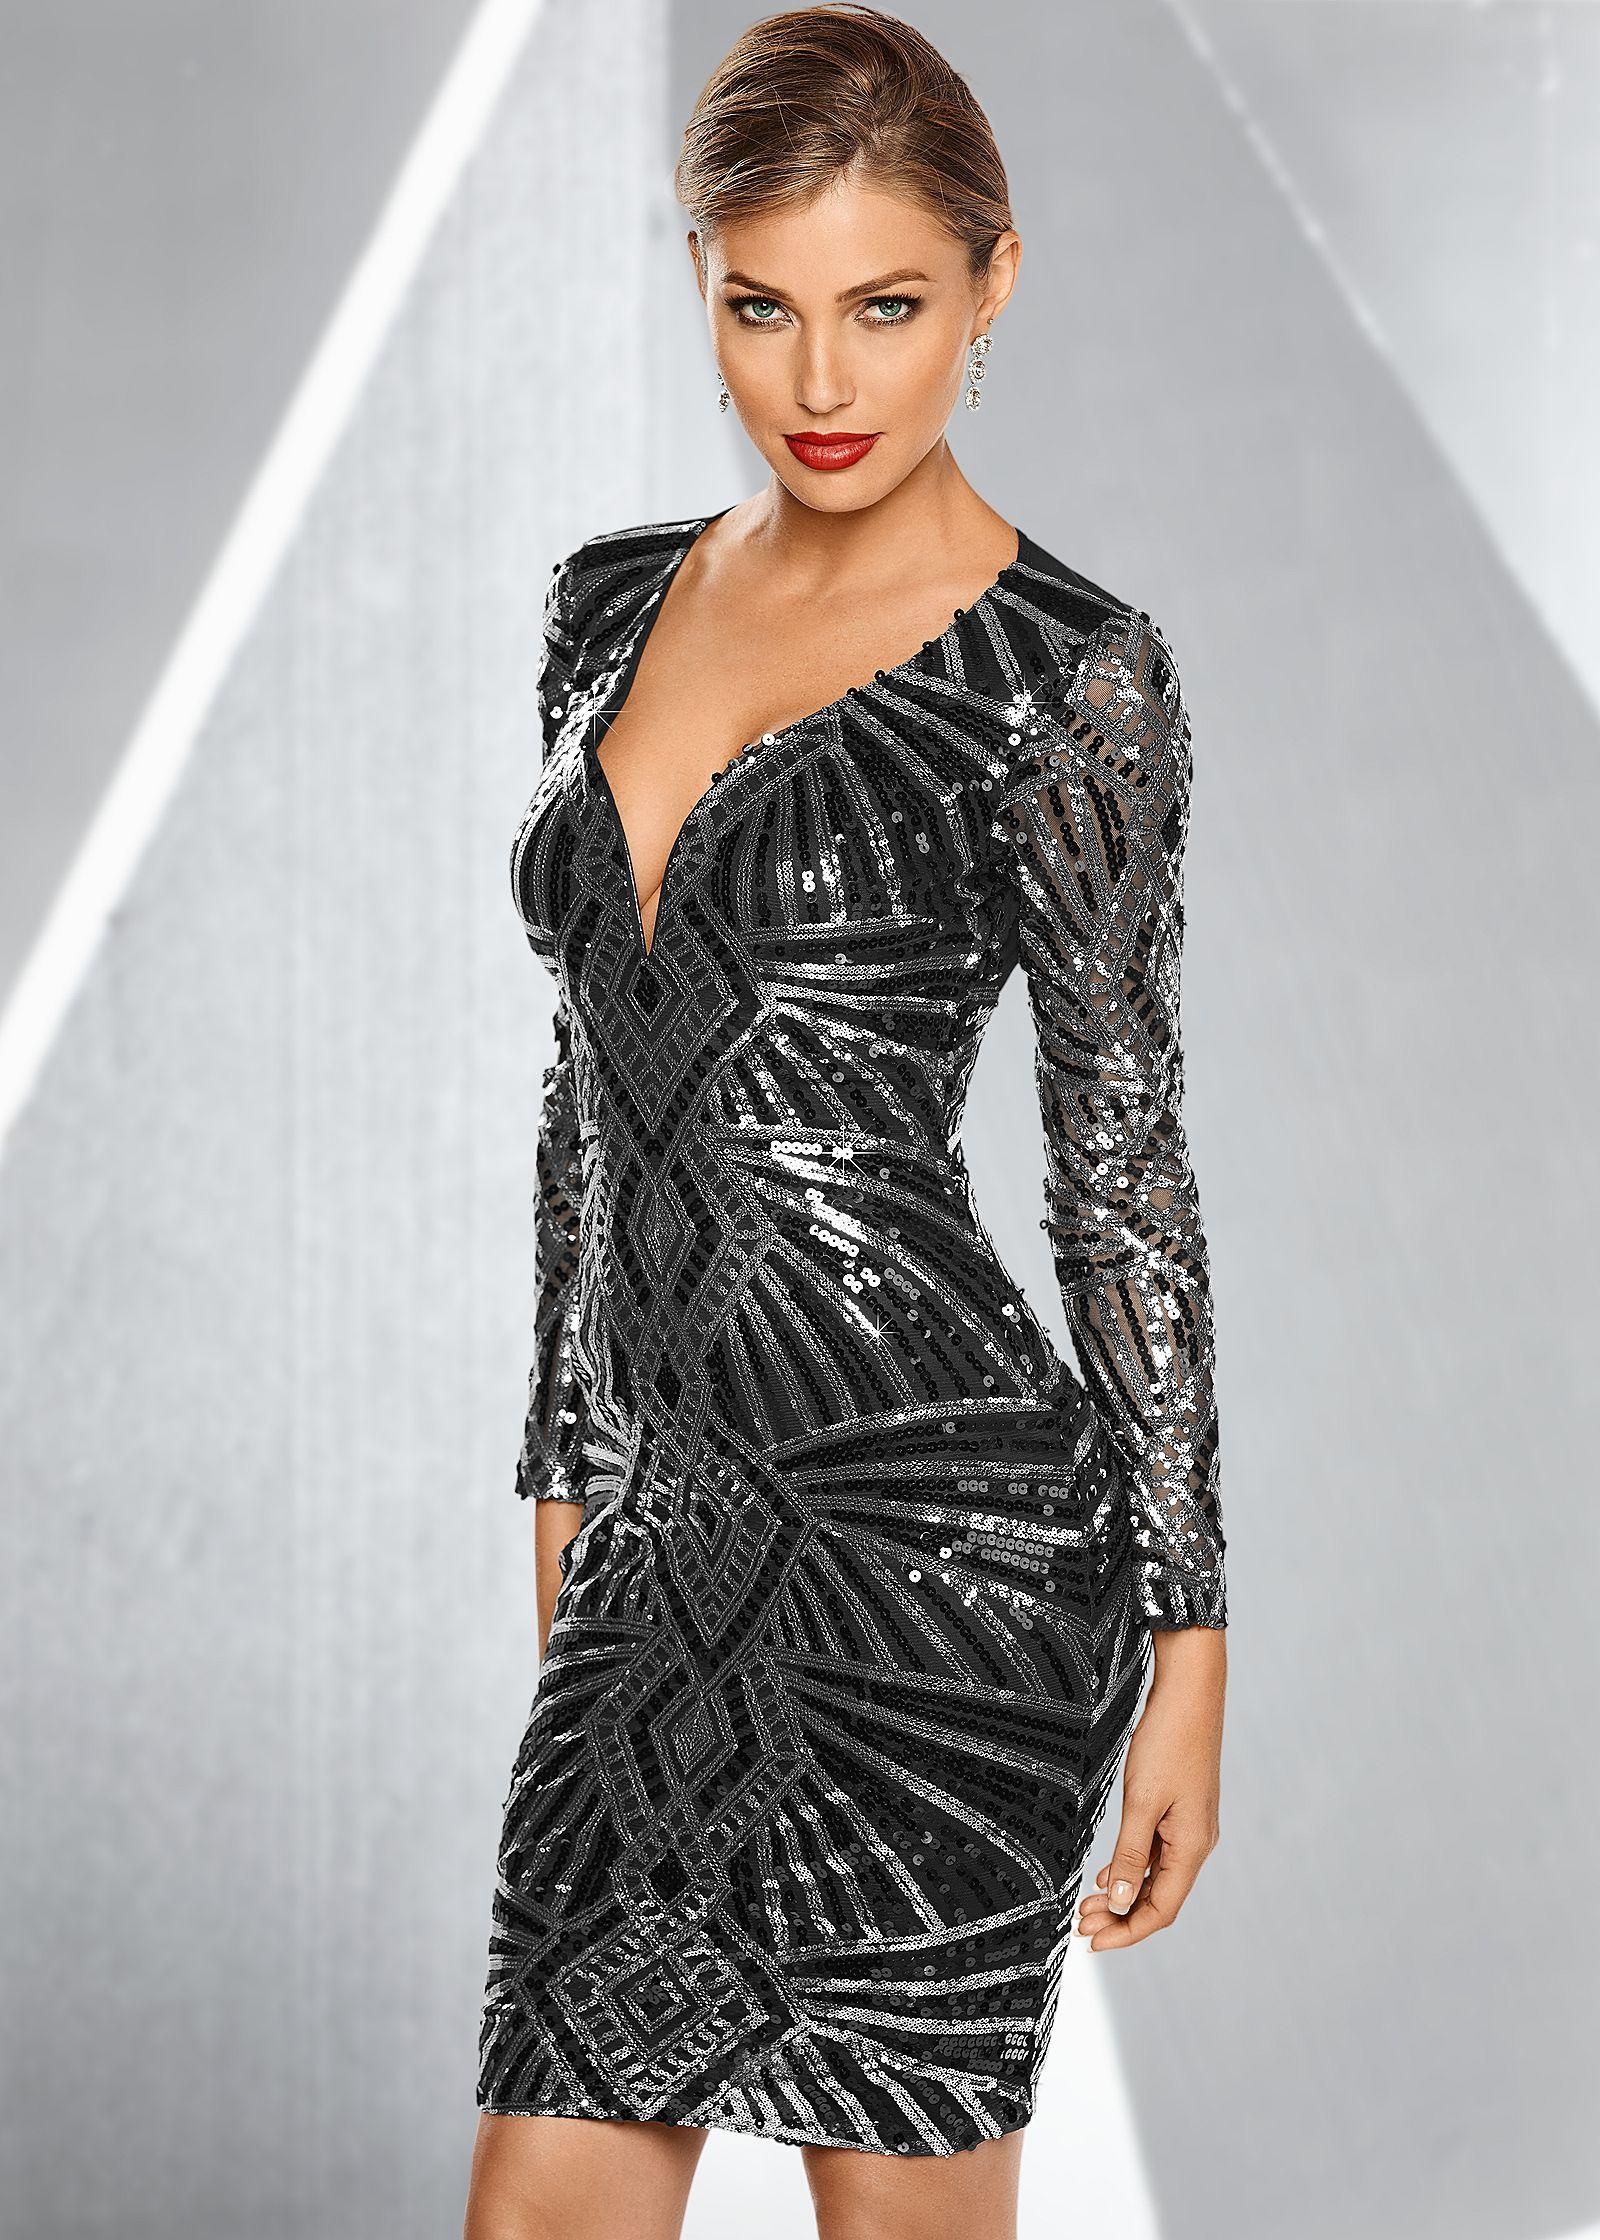 Sequin Party Dresses Nini Dress